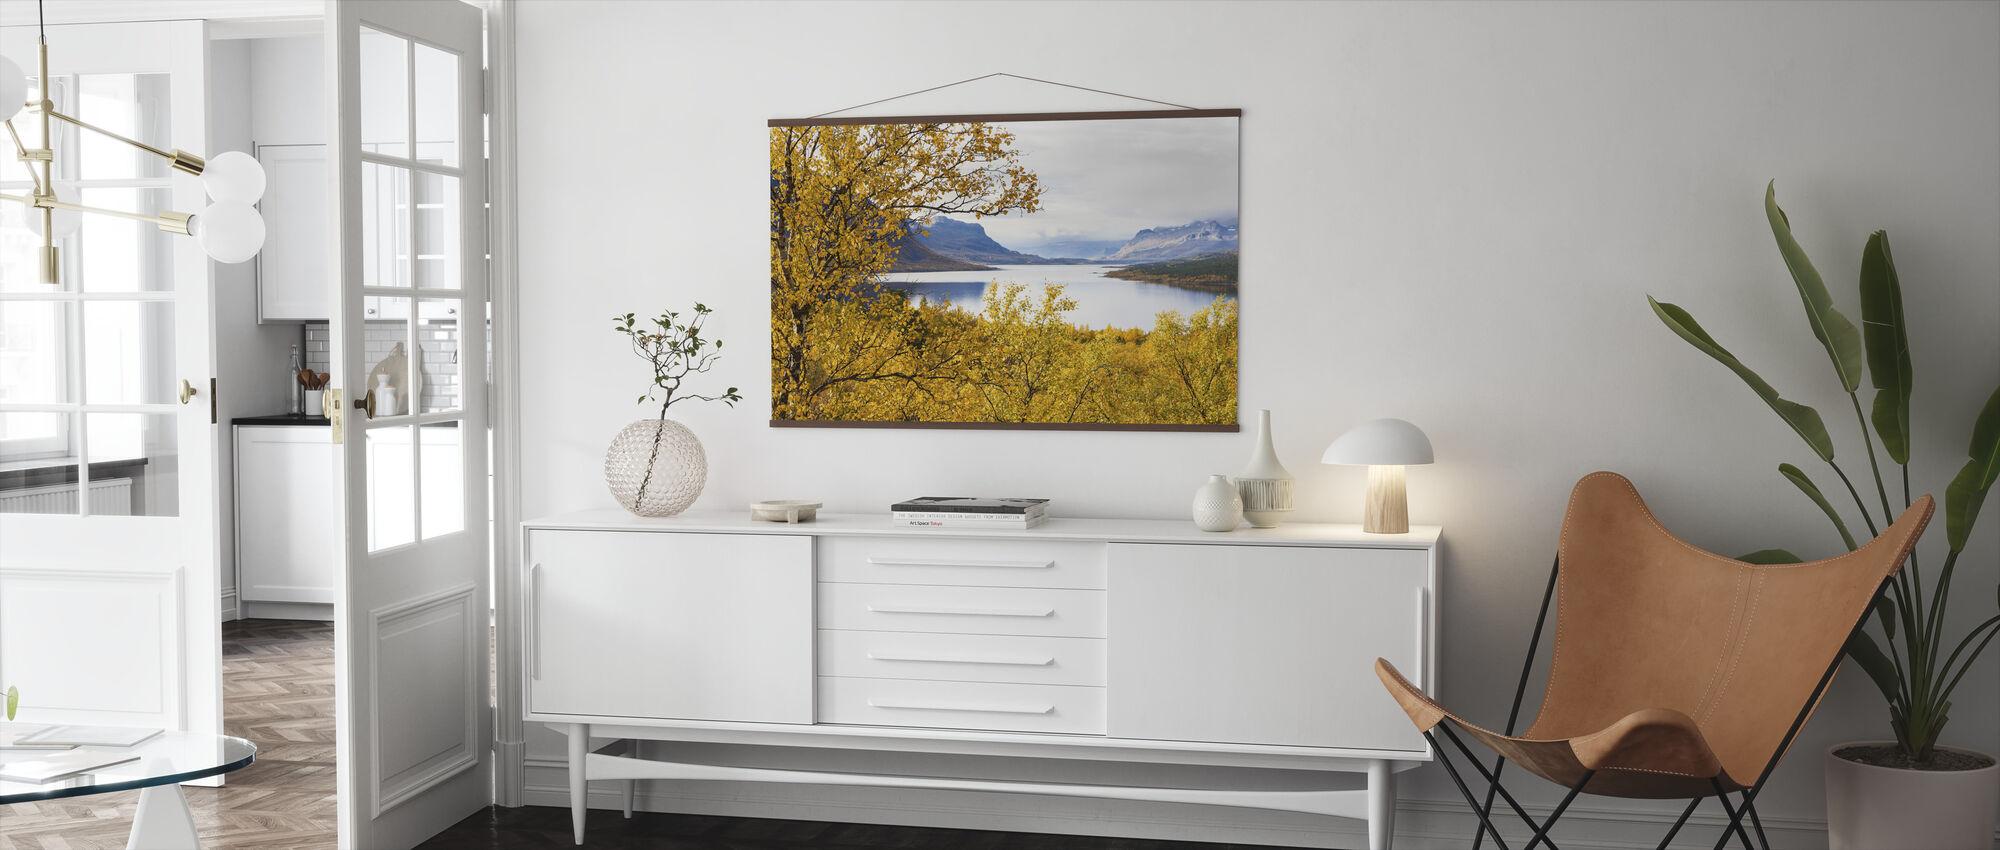 Saltoluokta Landscape - Poster - Living Room